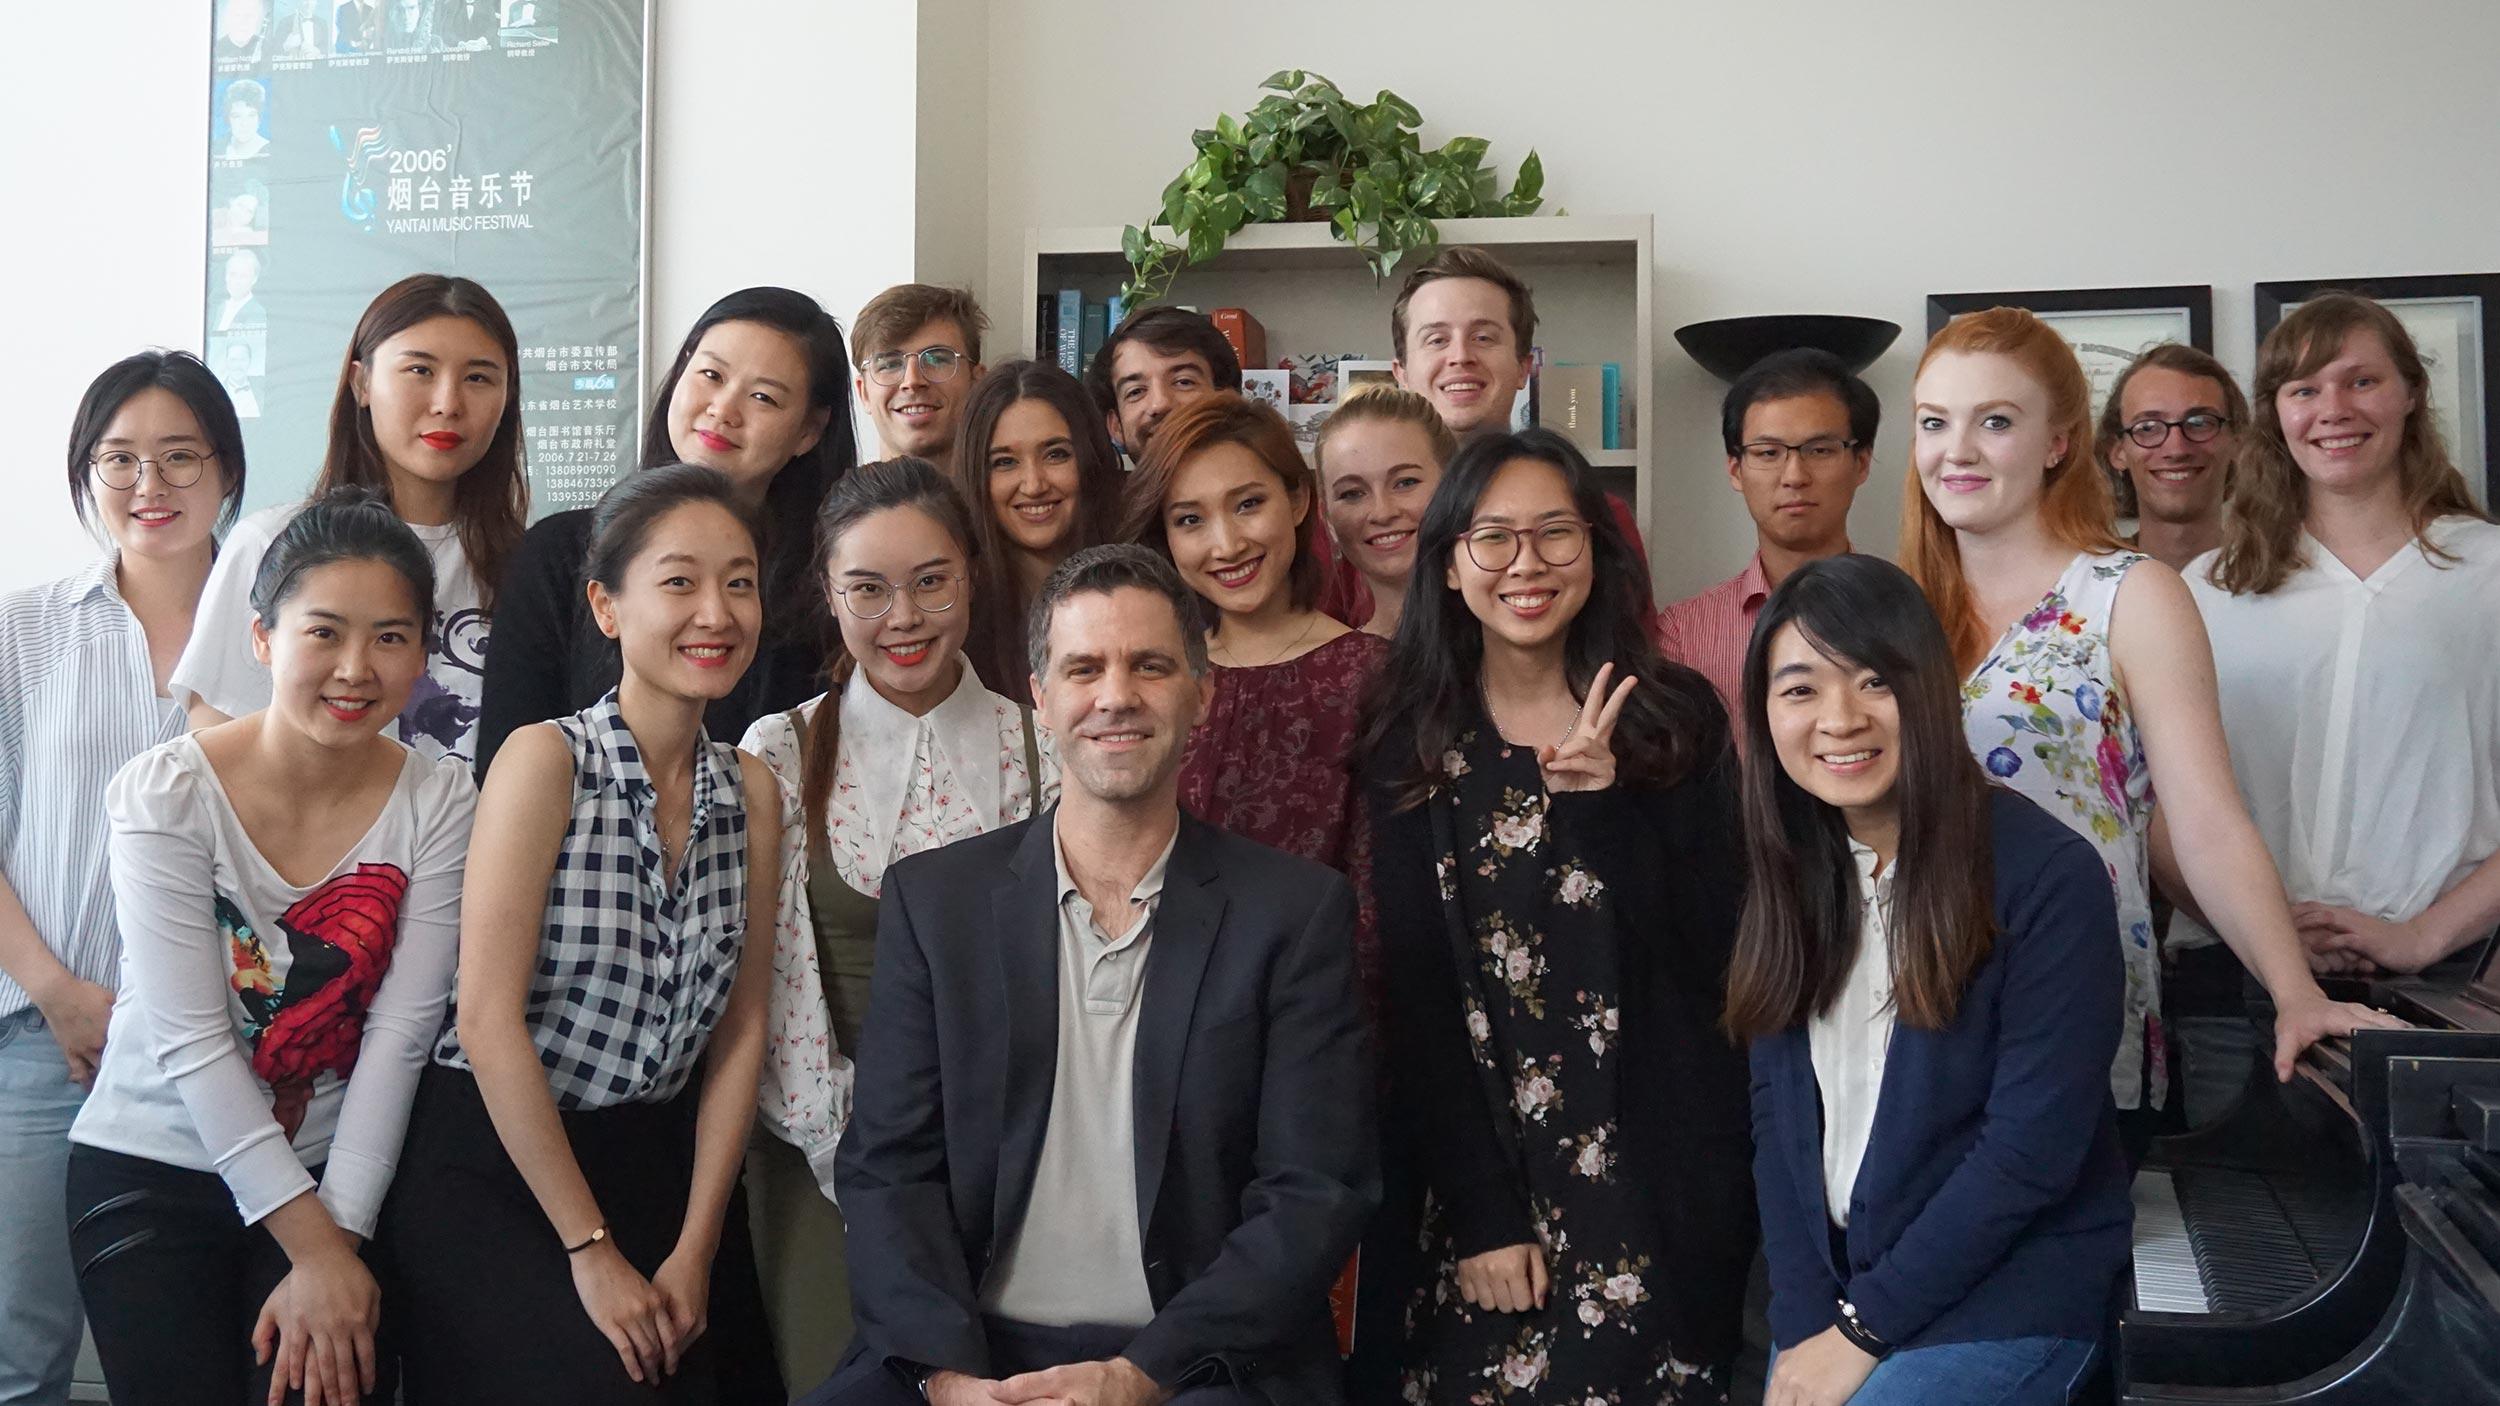 Joseph Rackers with students